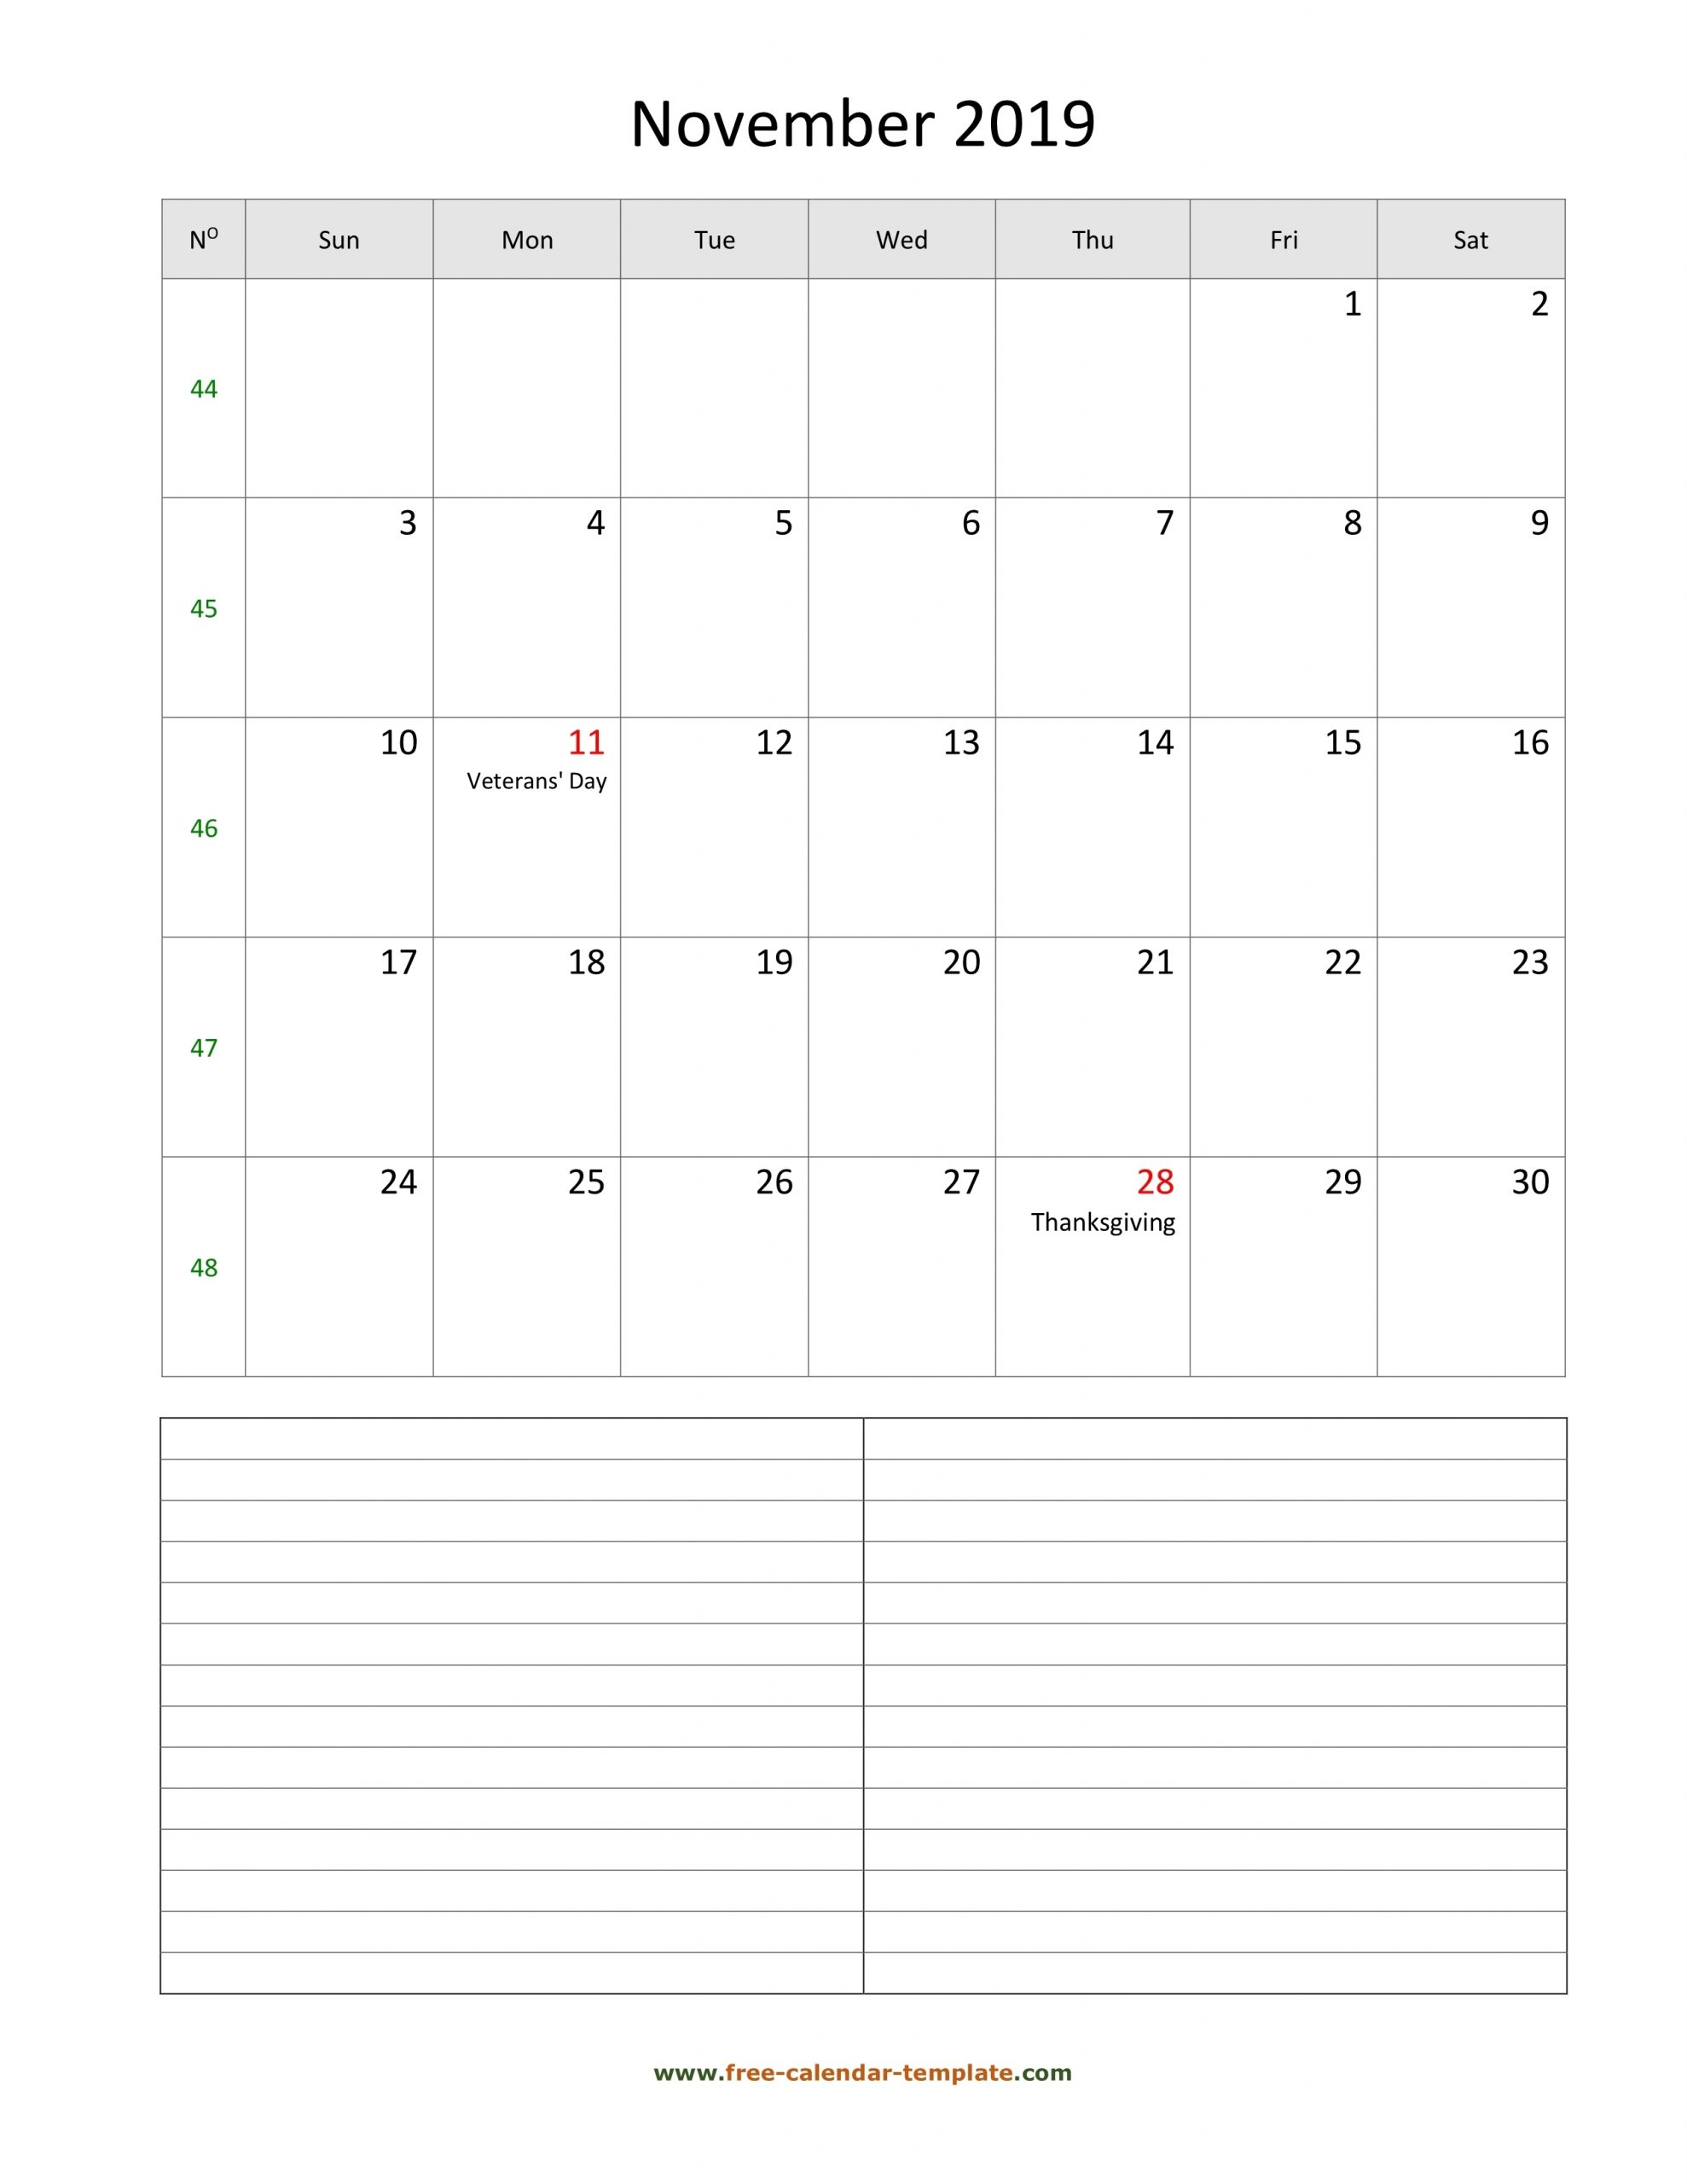 November 2019 Free Calendar Tempplate | Free-Calendar intended for Fill In Calendar 2019 Pdf